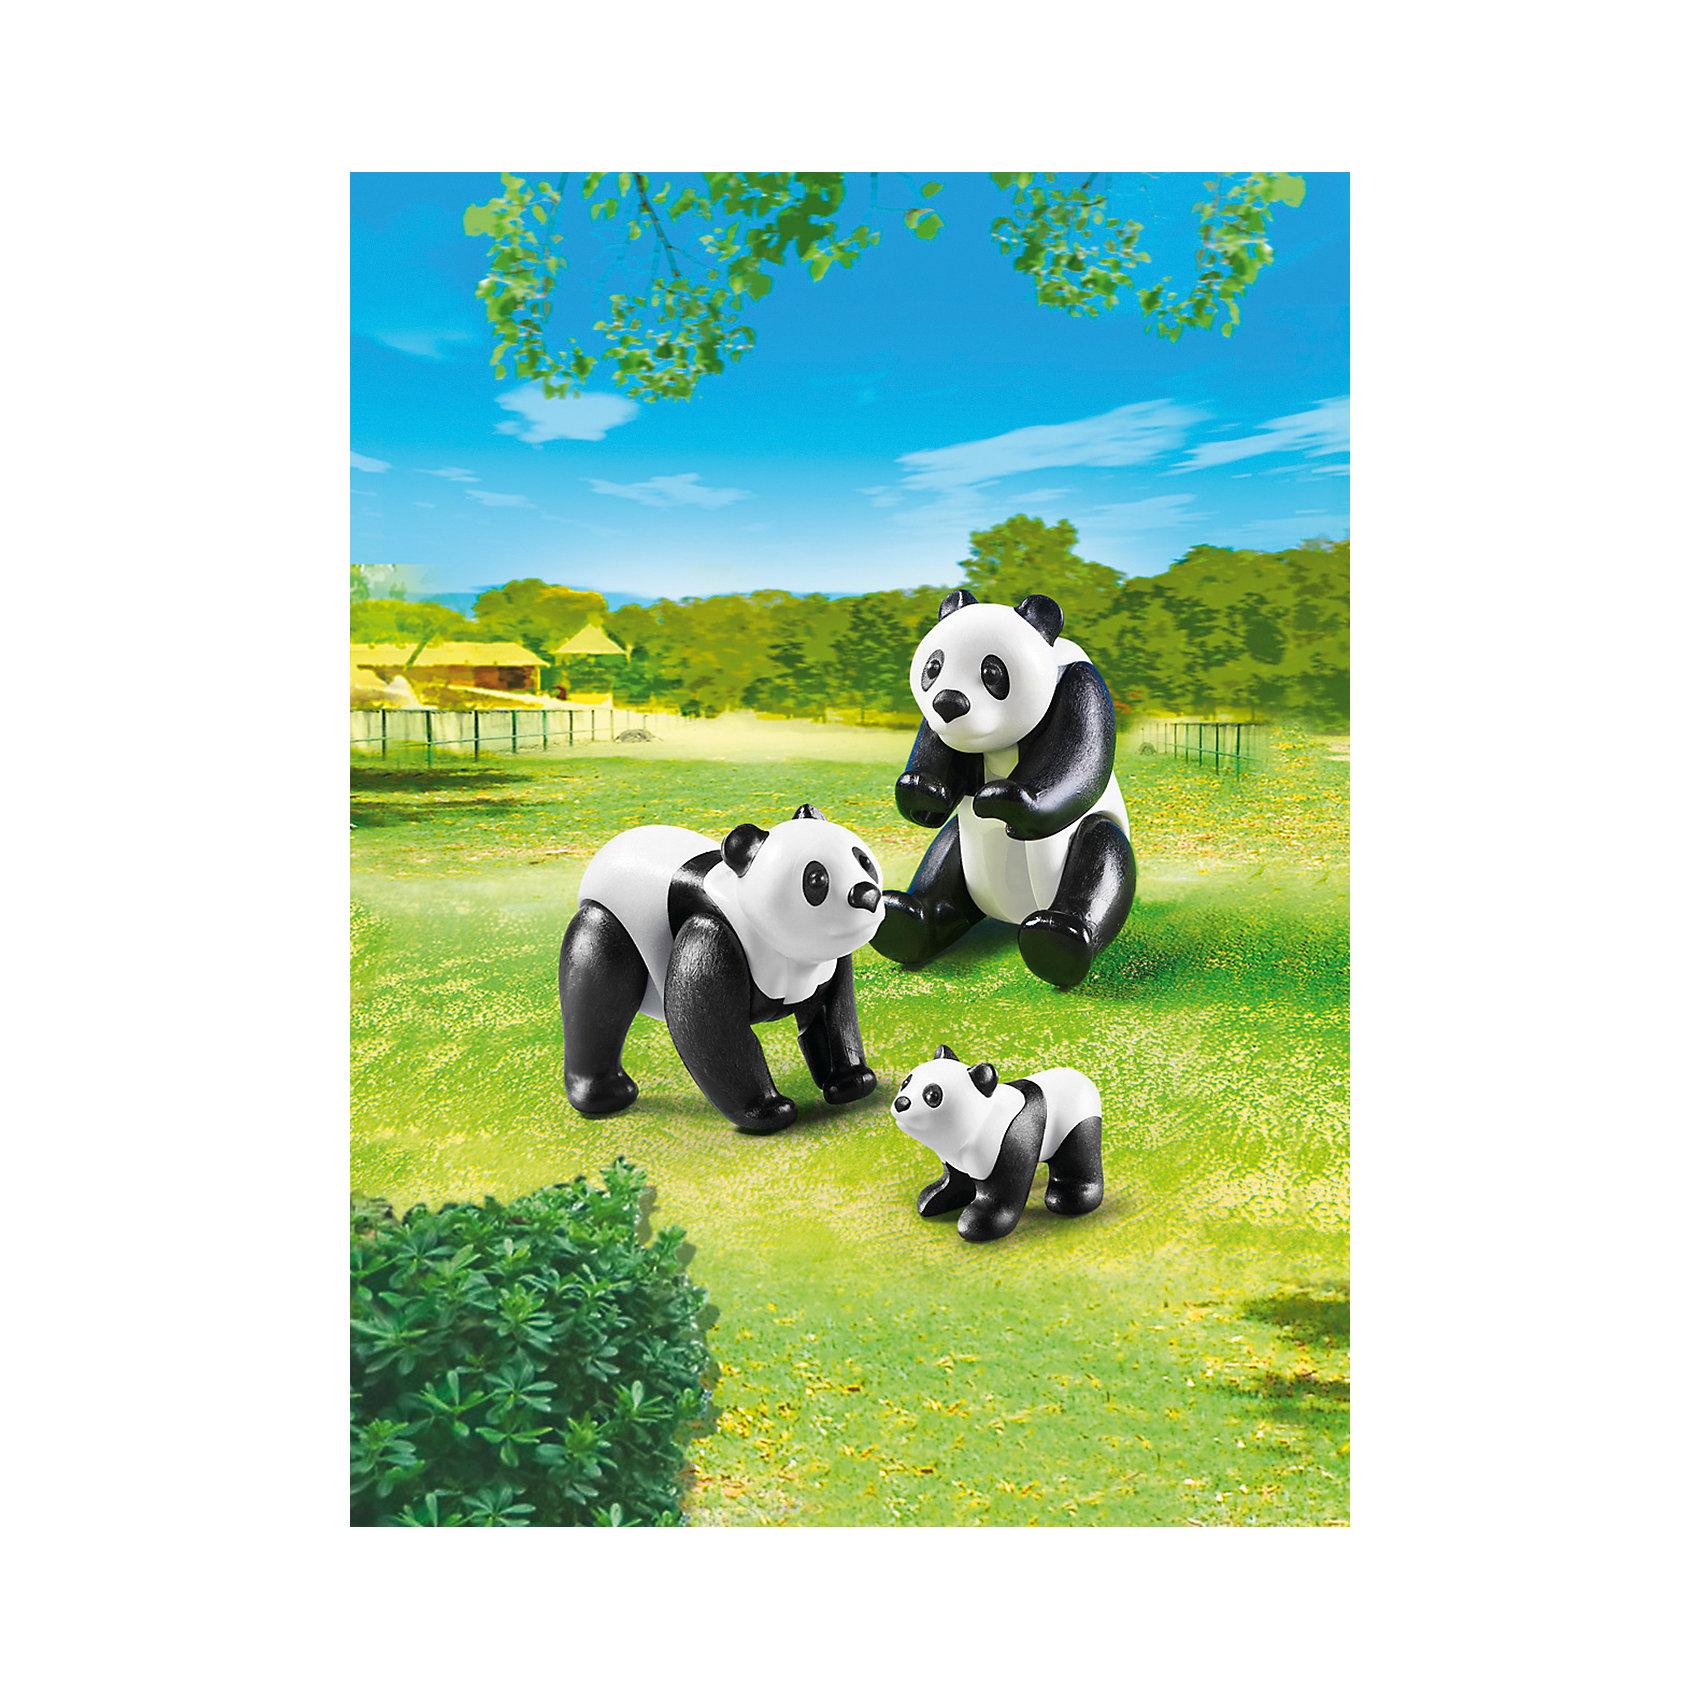 Зоопарк: Семья Панд, PLAYMOBILПластмассовые конструкторы<br><br><br>Ширина мм: 178<br>Глубина мм: 124<br>Высота мм: 50<br>Вес г: 51<br>Возраст от месяцев: 48<br>Возраст до месяцев: 120<br>Пол: Унисекс<br>Возраст: Детский<br>SKU: 3786378